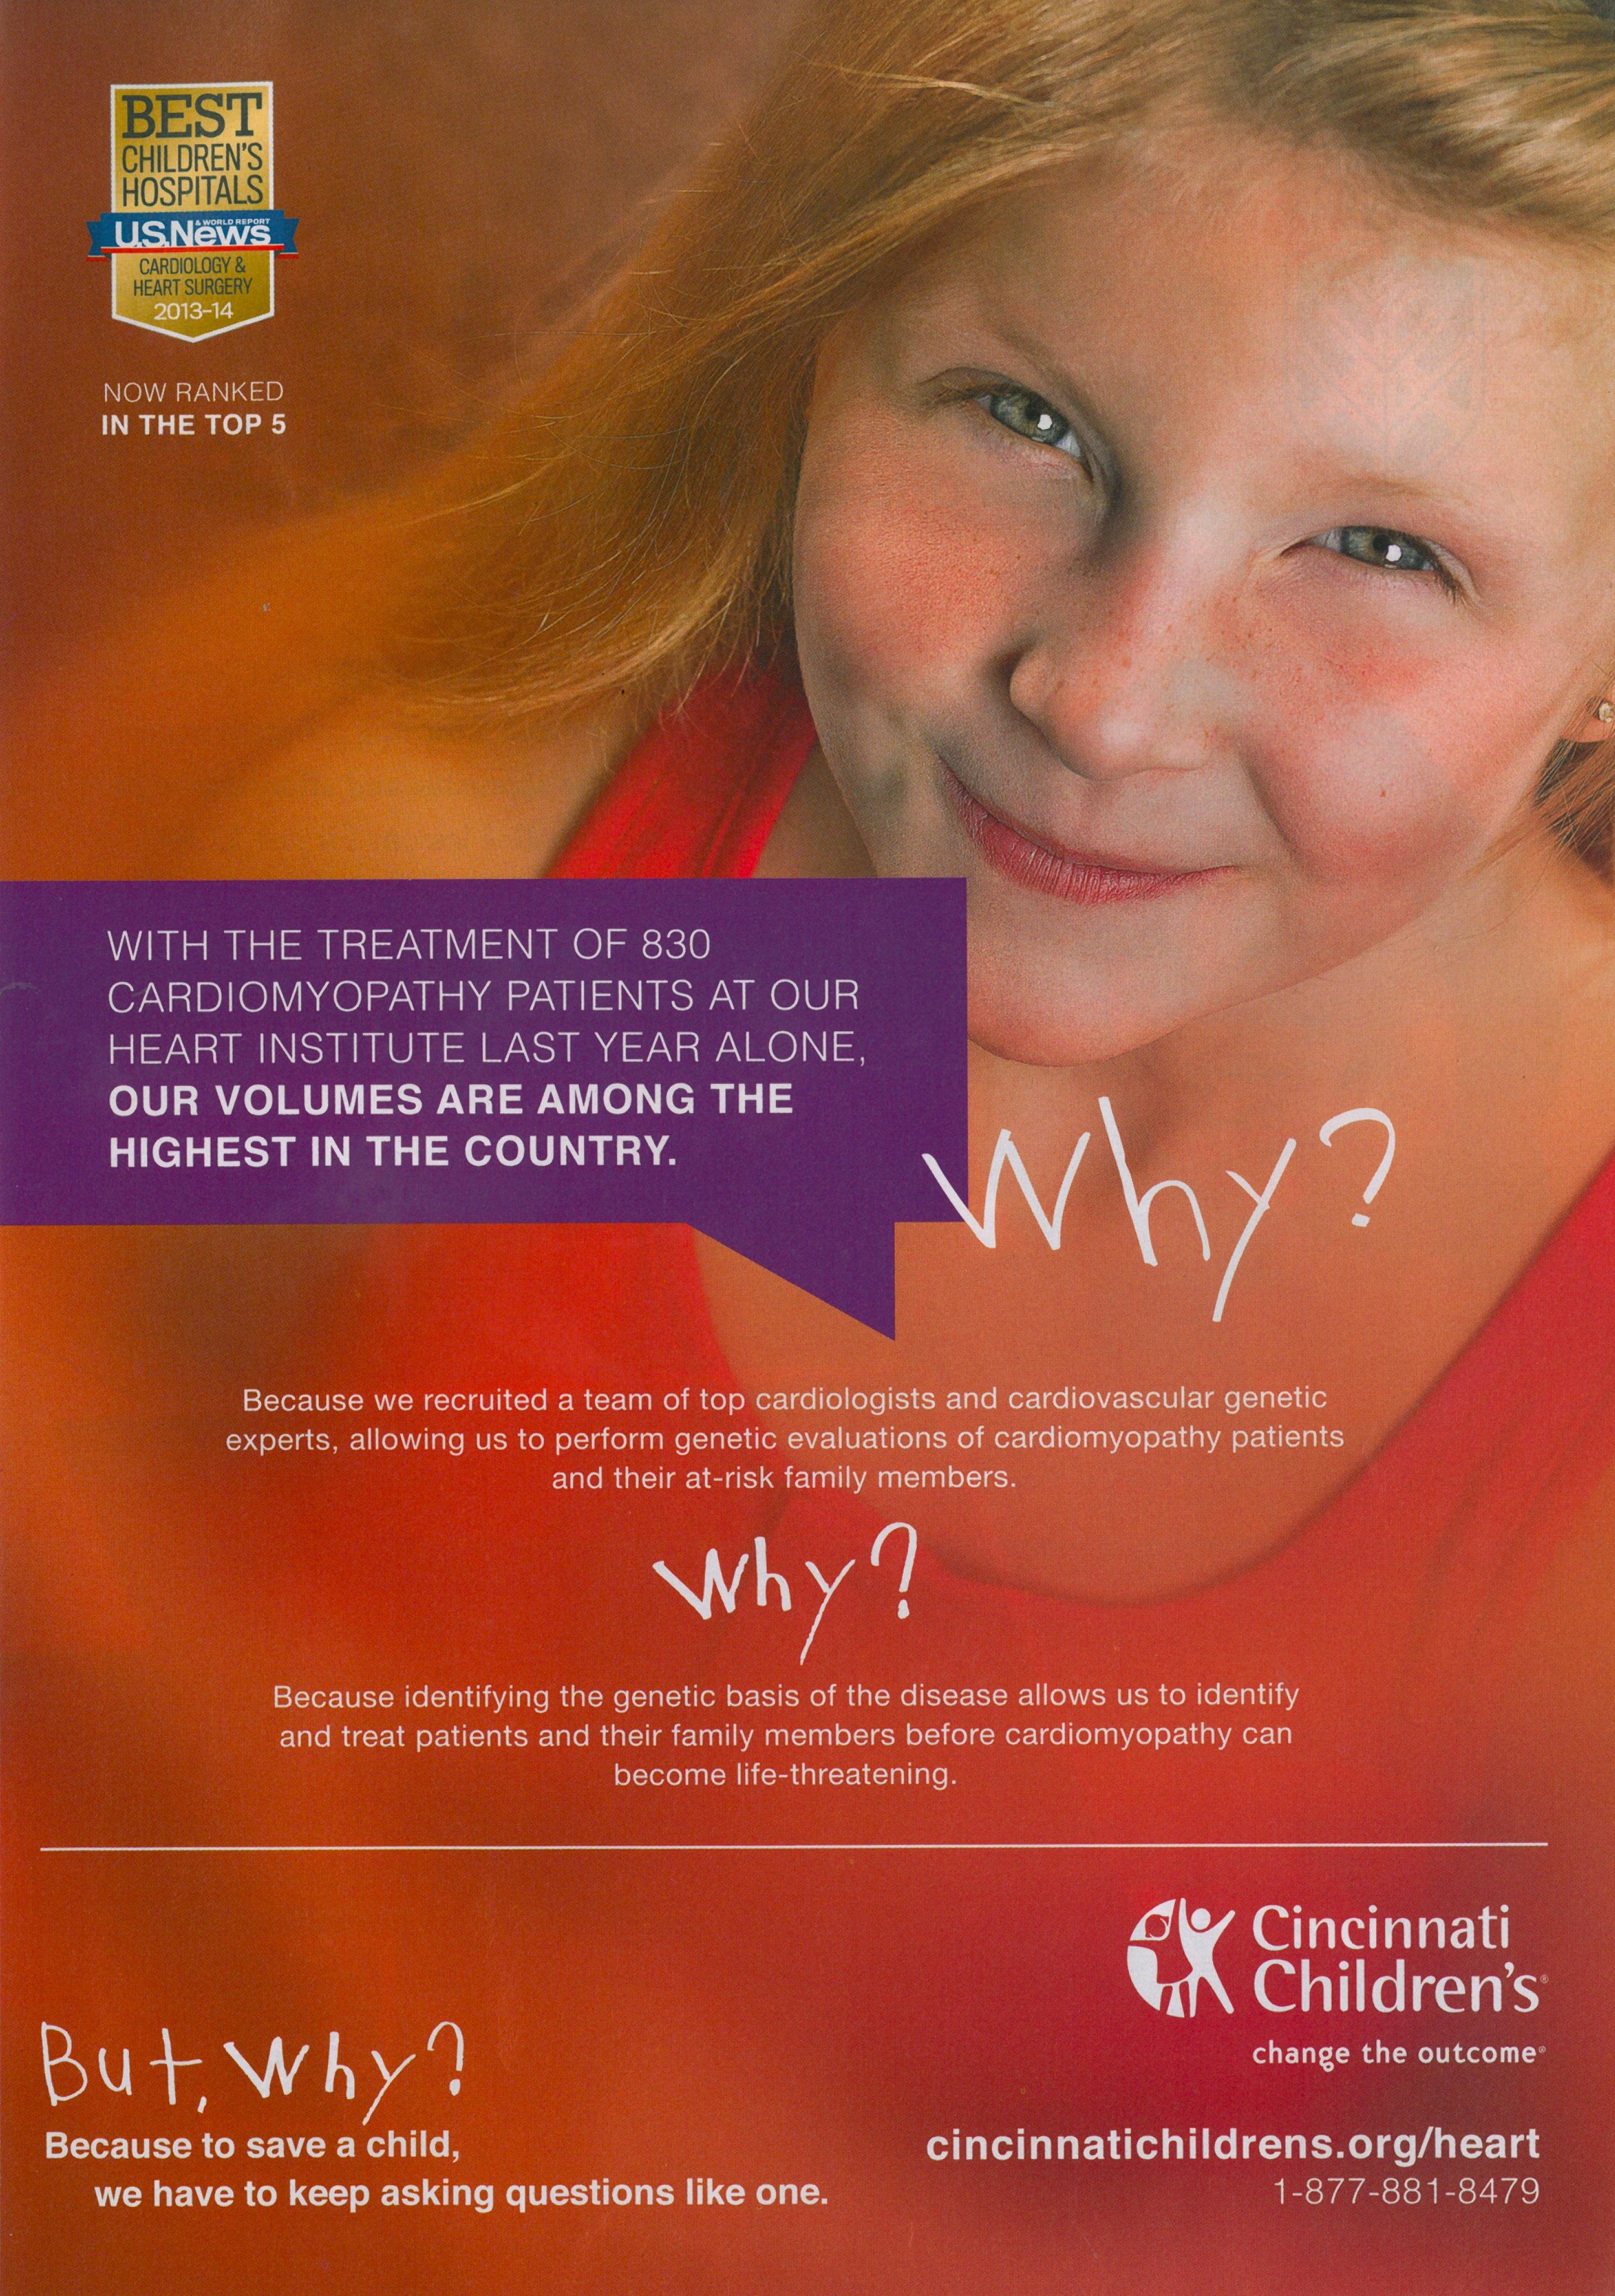 Cincinnati classifieds for personals Cincinnati Classifieds - Search Craigslist for Cincinnati, OH Classified Ads